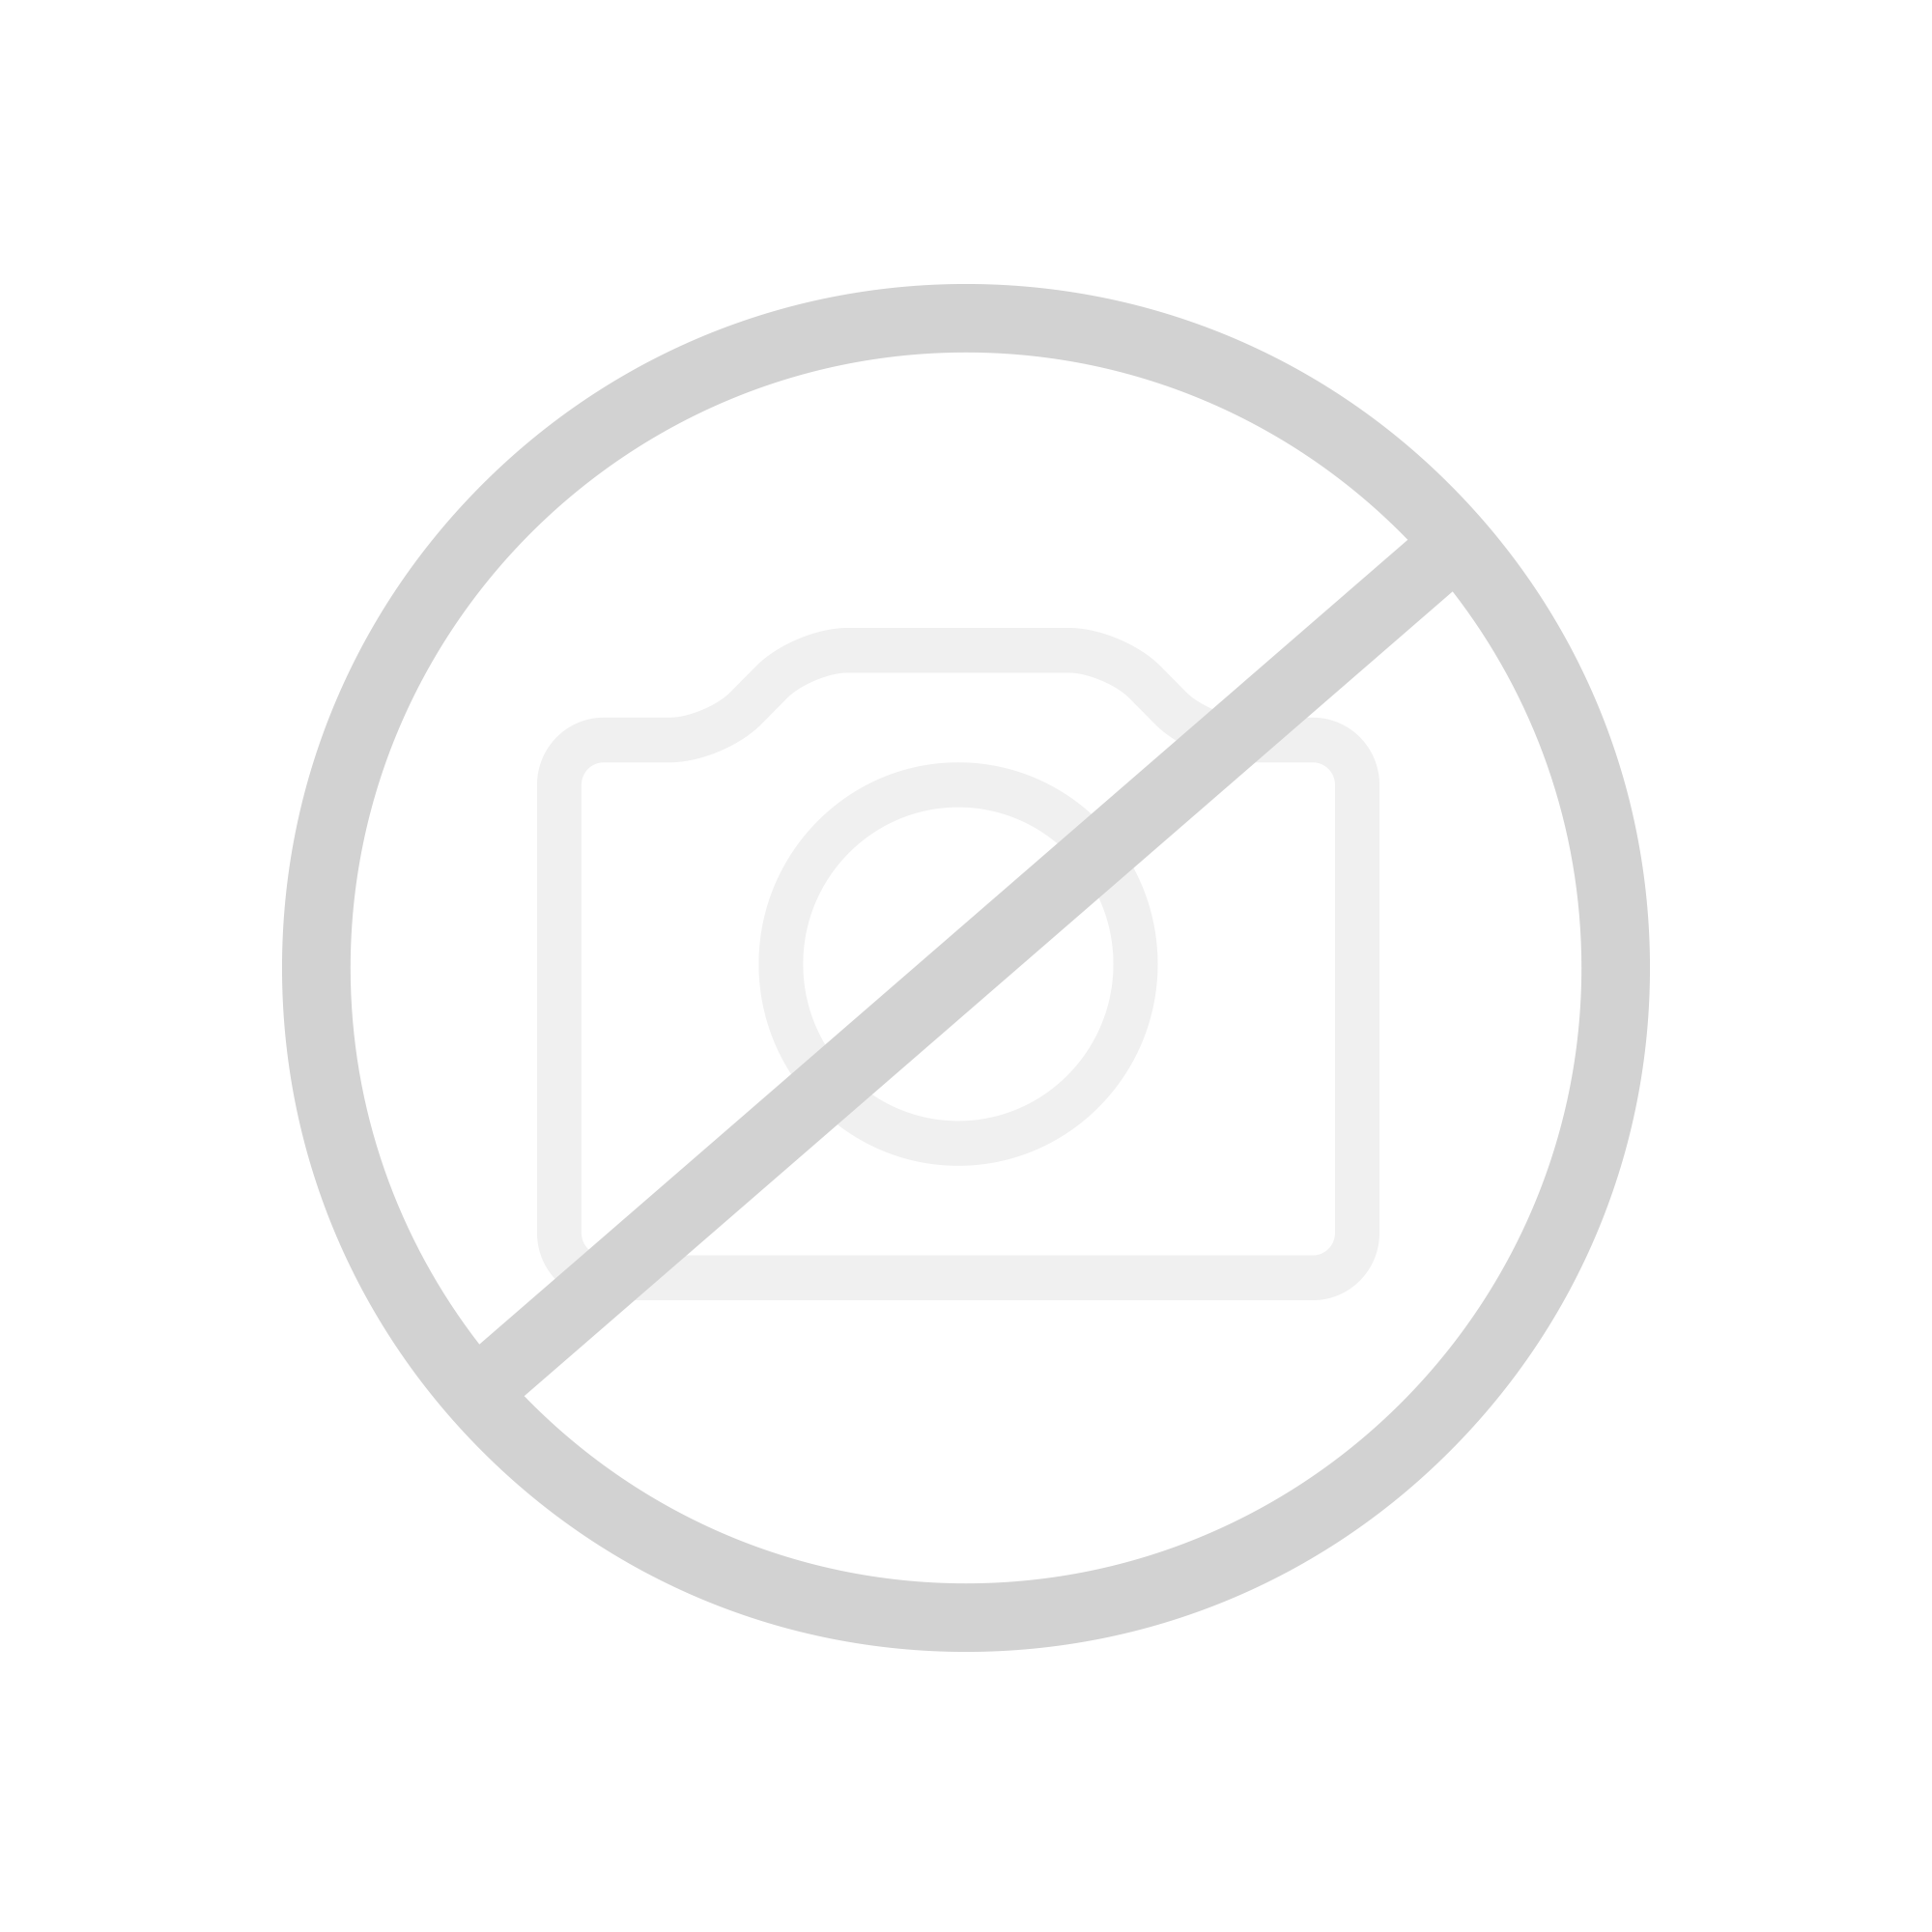 kaldewei centro duo 1 sonderform badewanne links pergamon 283600010231 reuter onlineshop. Black Bedroom Furniture Sets. Home Design Ideas